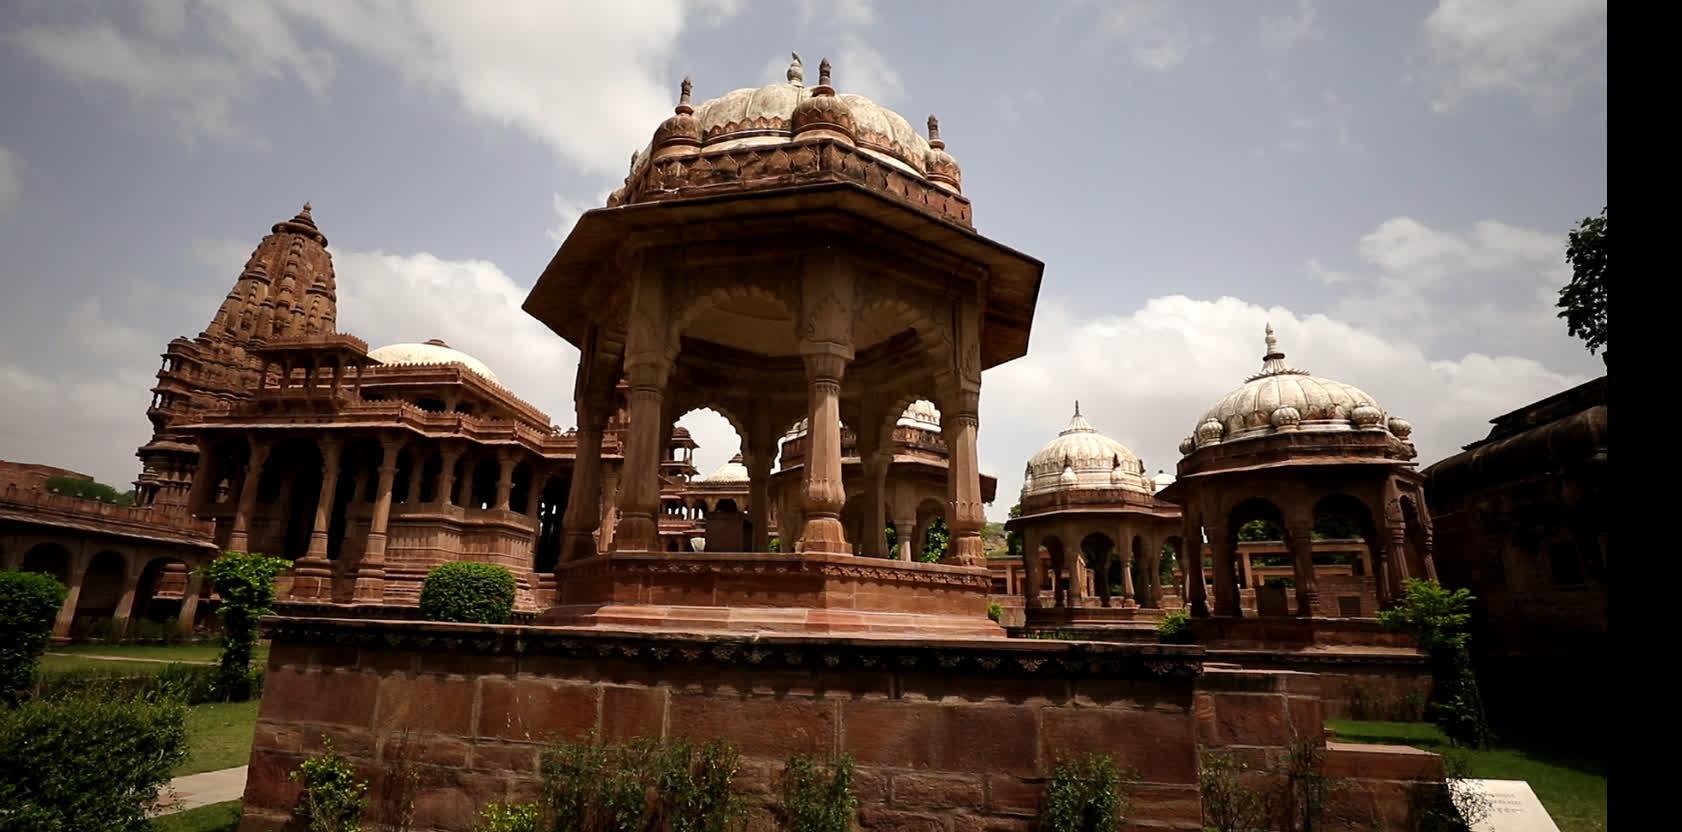 Marwar's Royal Memorials